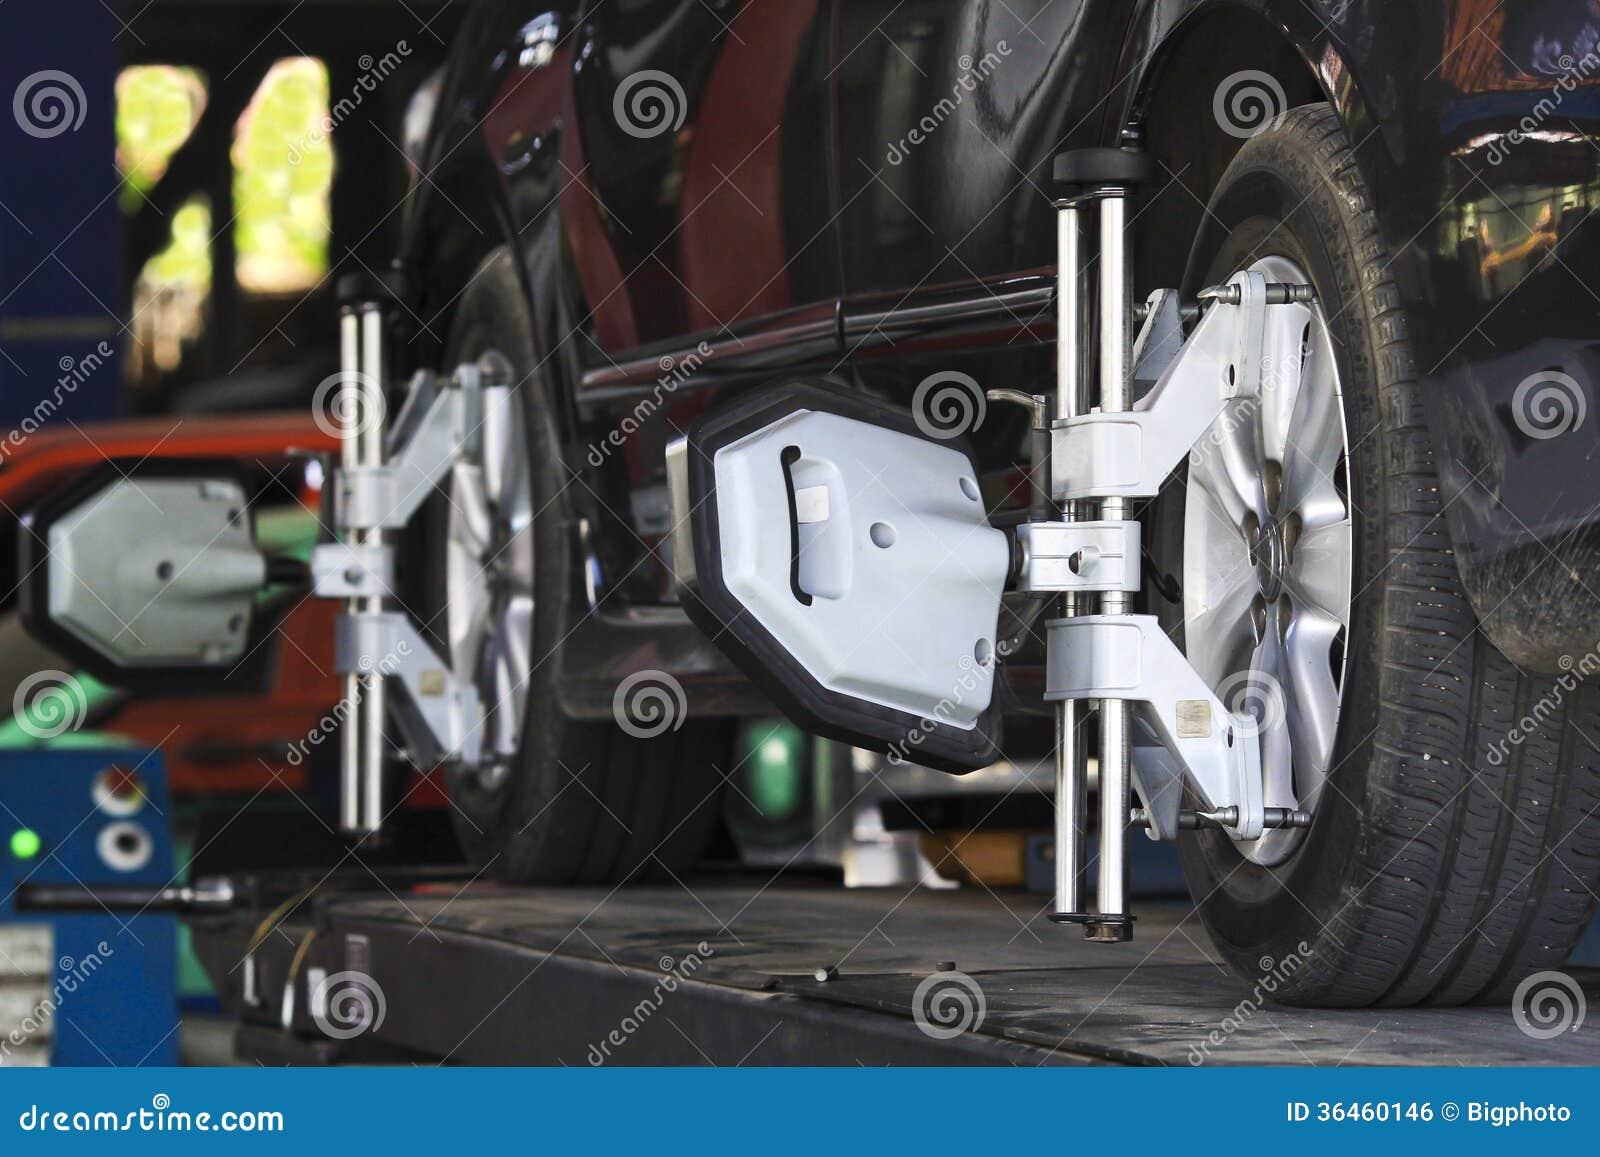 Wheel Alignment Machine >> Car Wheel Fixed With Computerized Wheel Alignment Machine ...